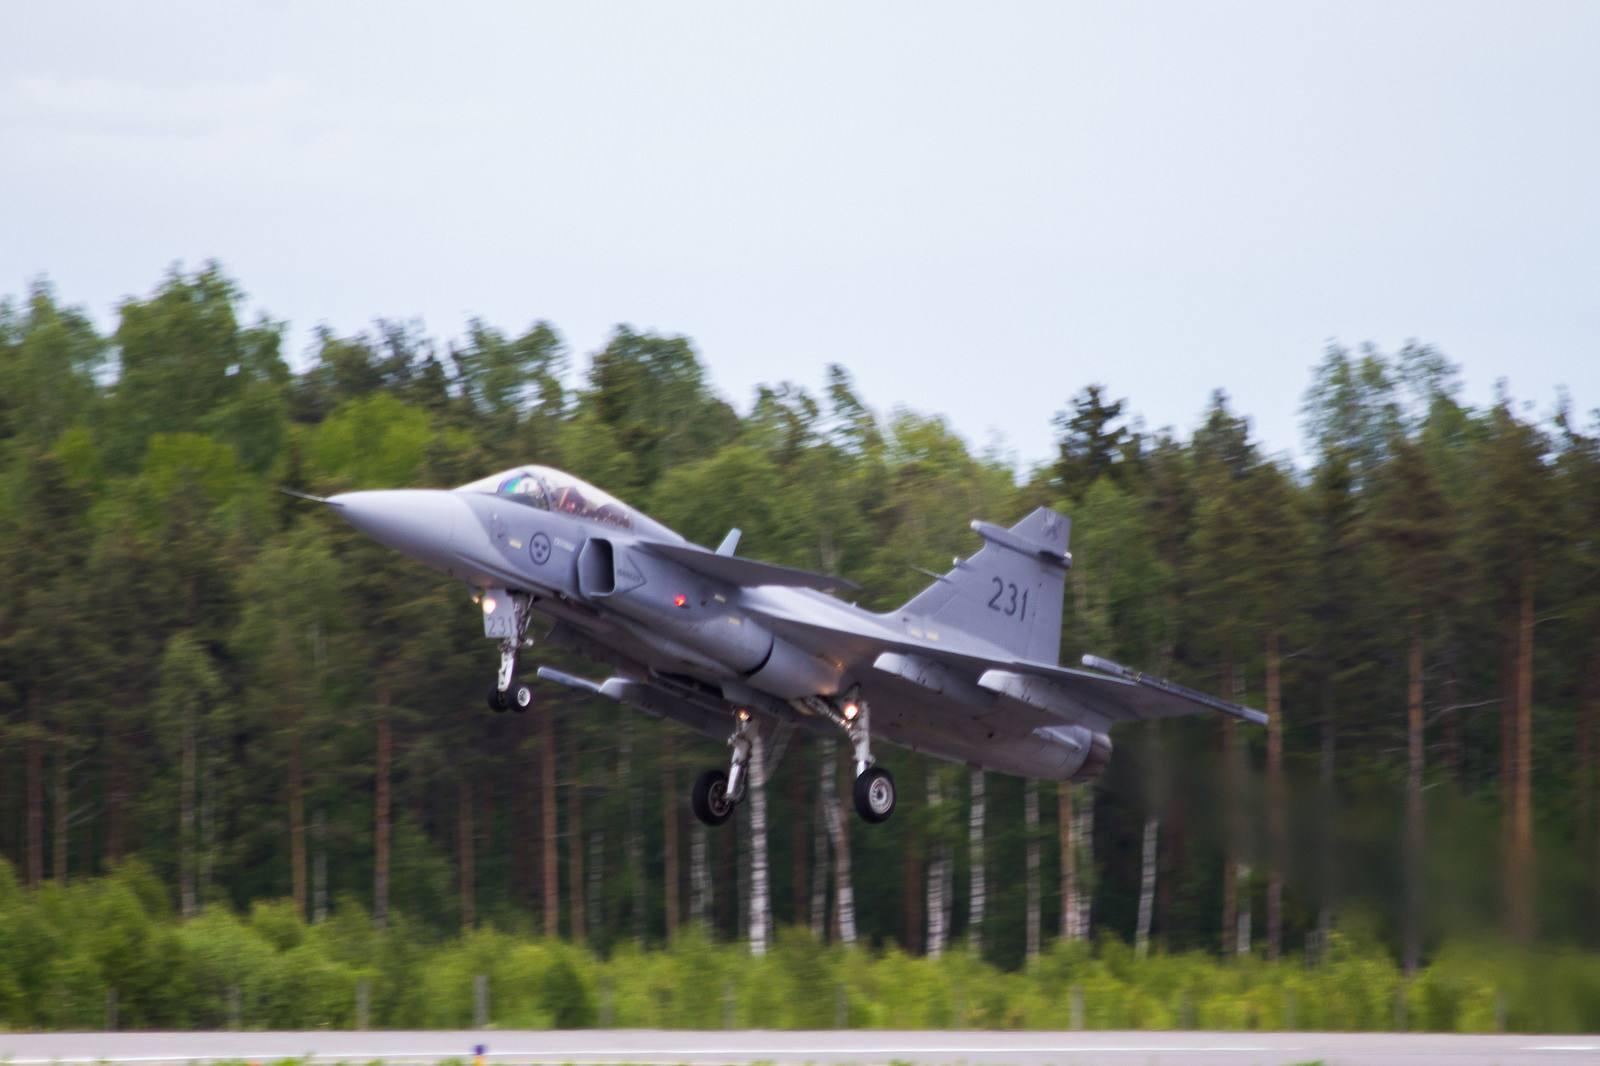 airshow 20155 Turku International Airshow 2015